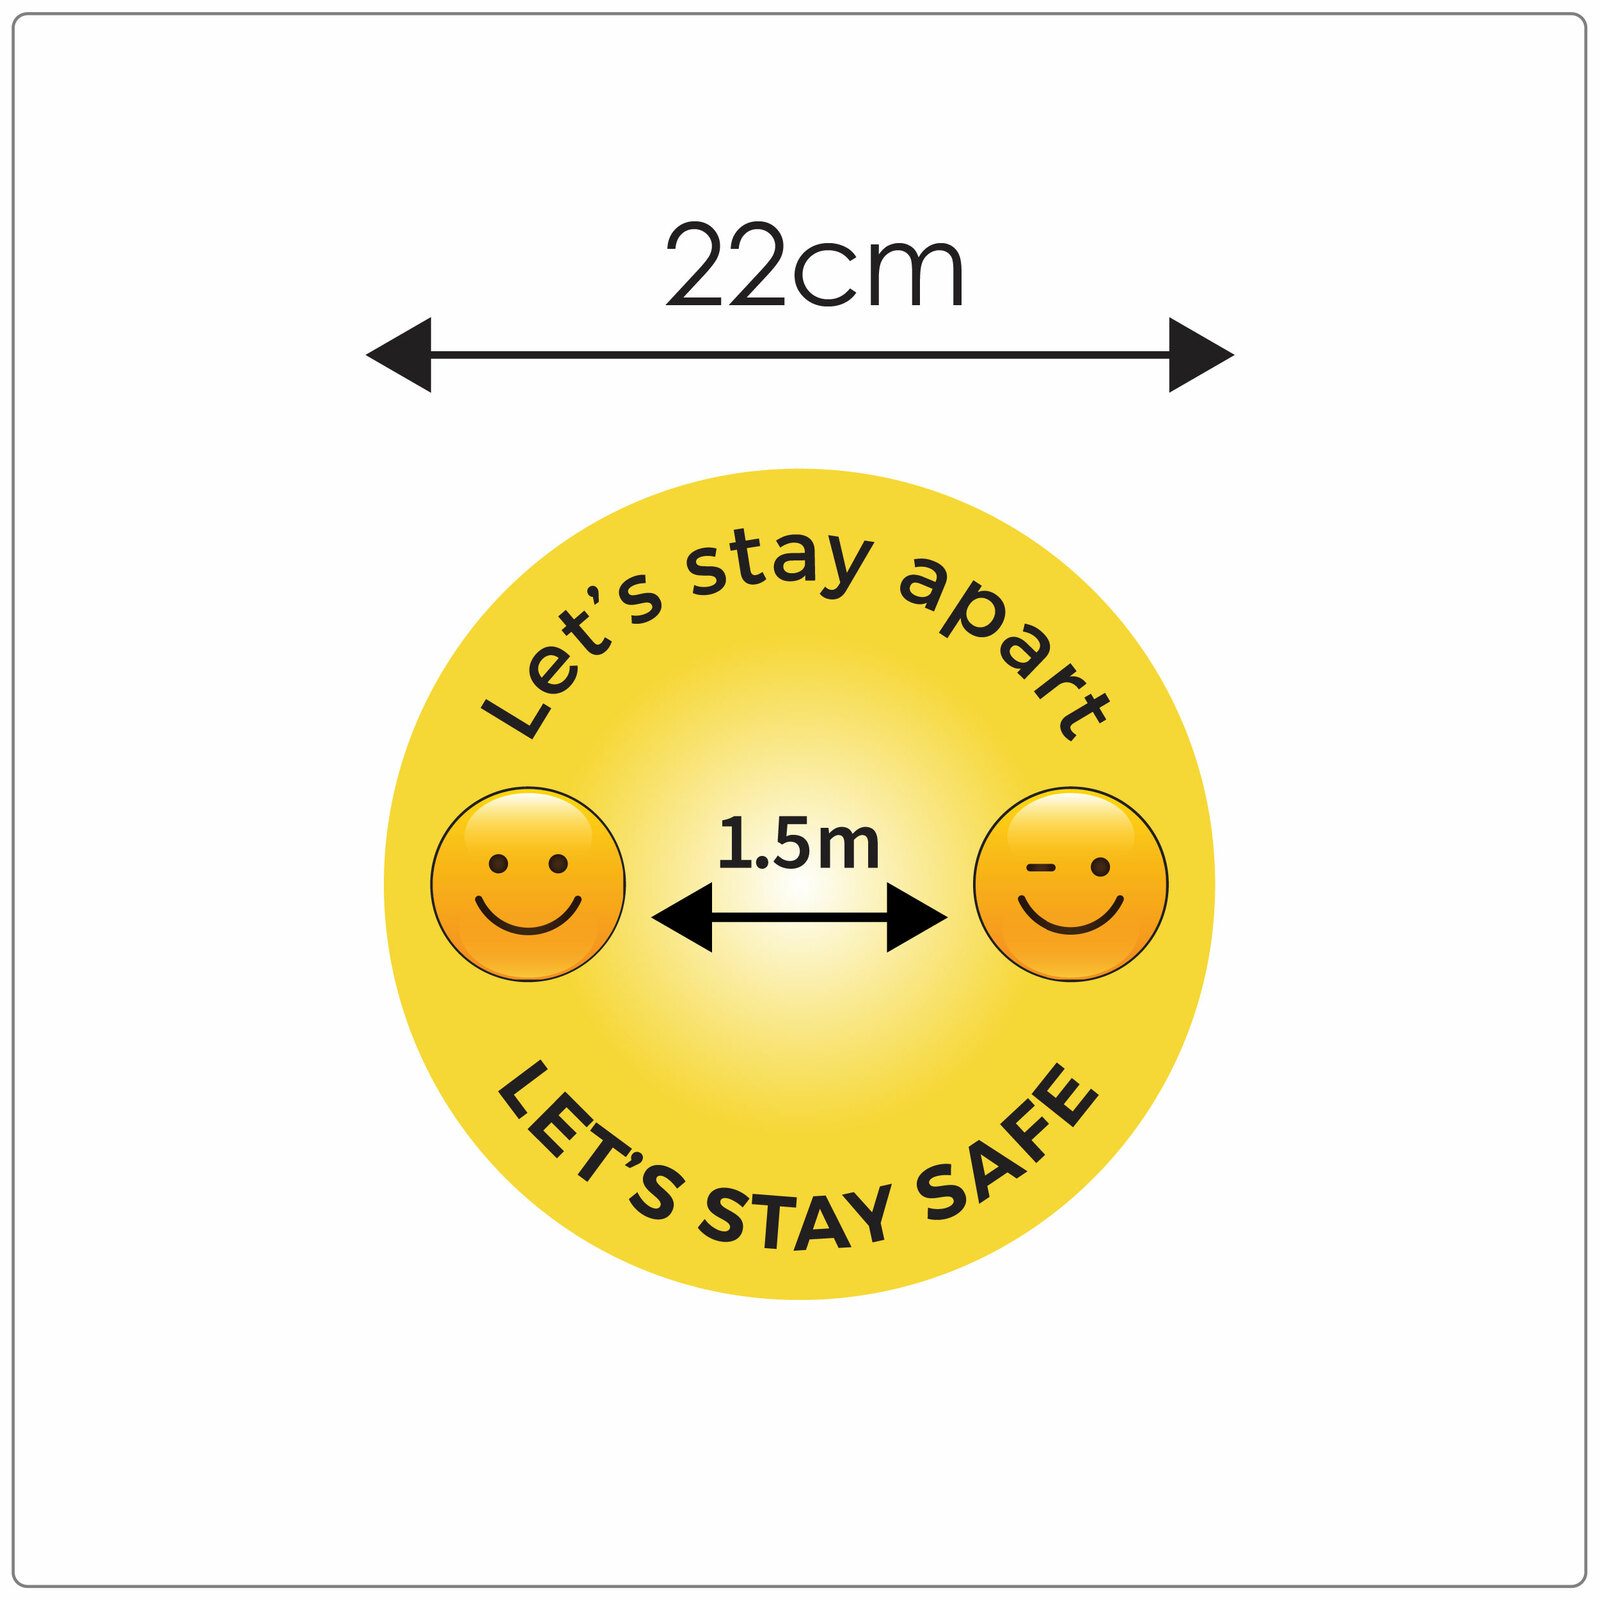 1.5 meter social distancing floor sign for hard floors, size, emoji Self-adhesive Corona floor marker safety floor sticker for COVID-19